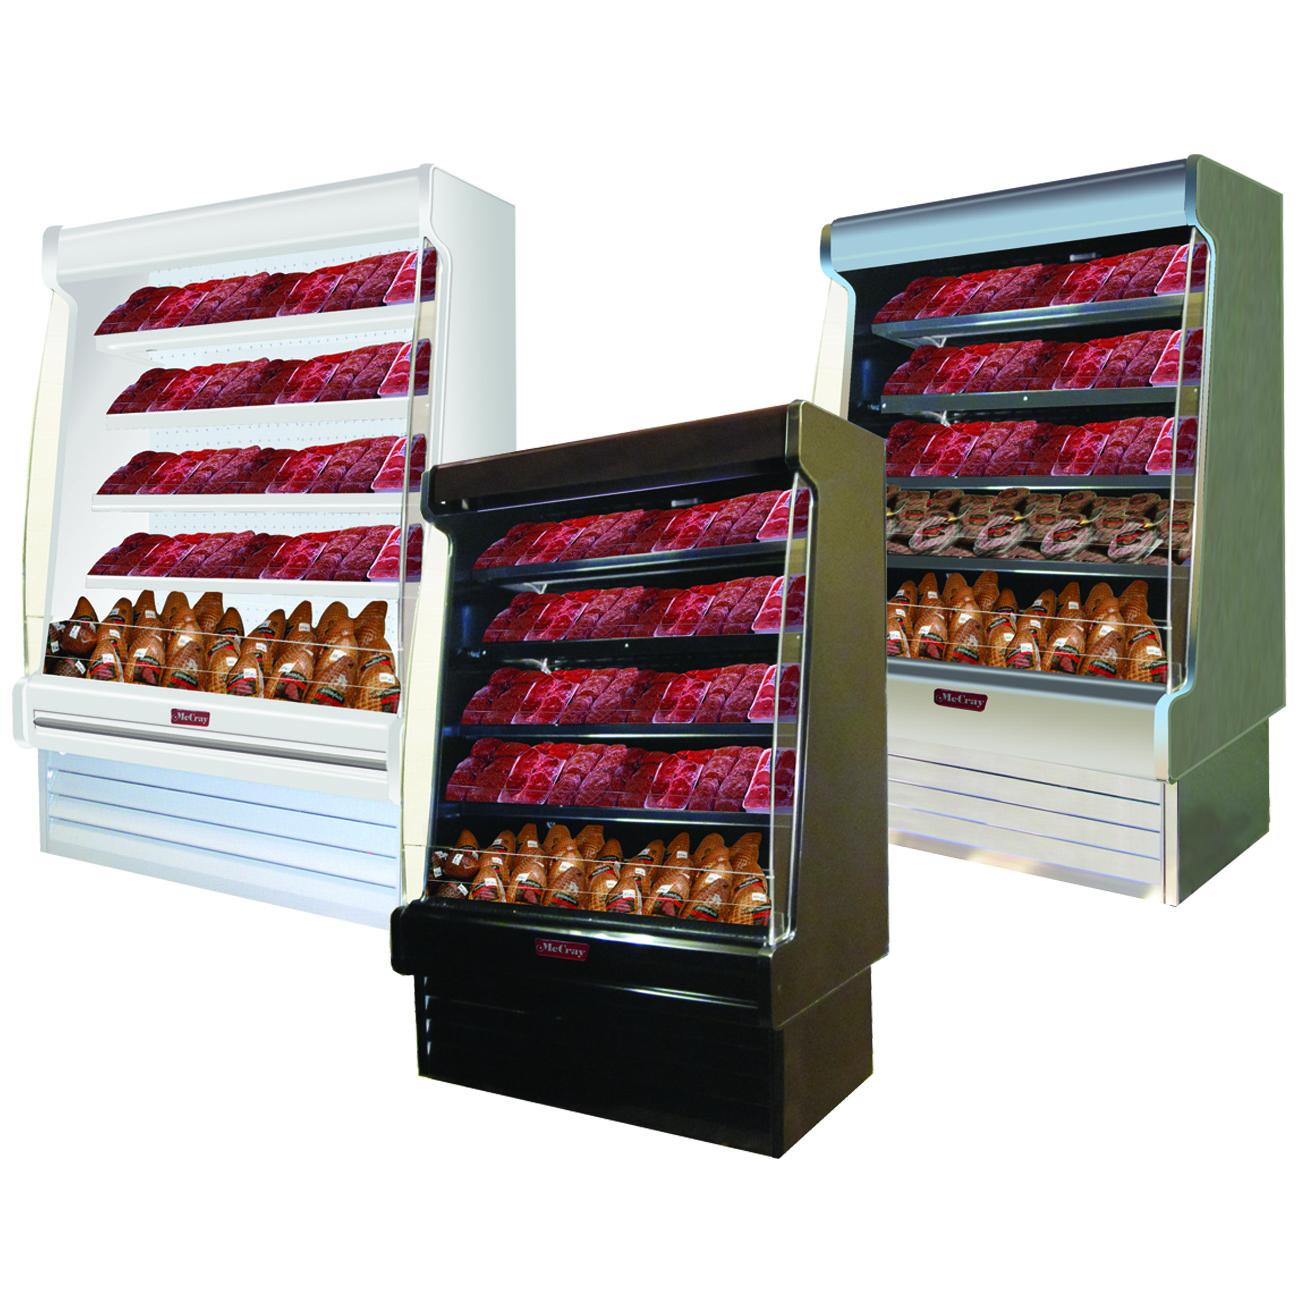 Howard-McCray R-OM35E-4S-B-LED merchandiser, open refrigerated display